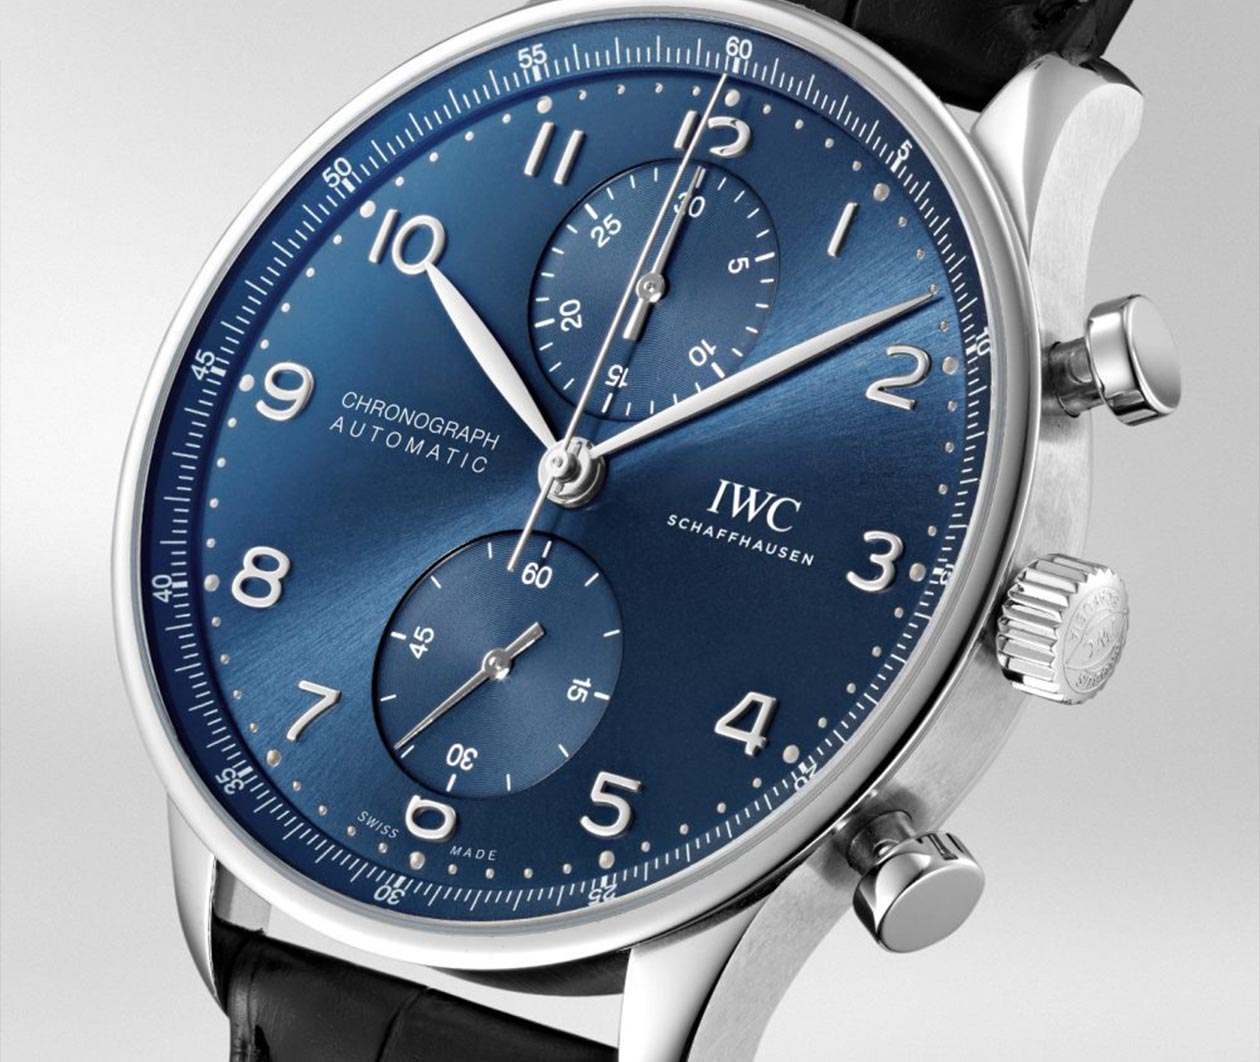 IWC Portugieser Chronograph IW371606 Carousel 3 FINAL